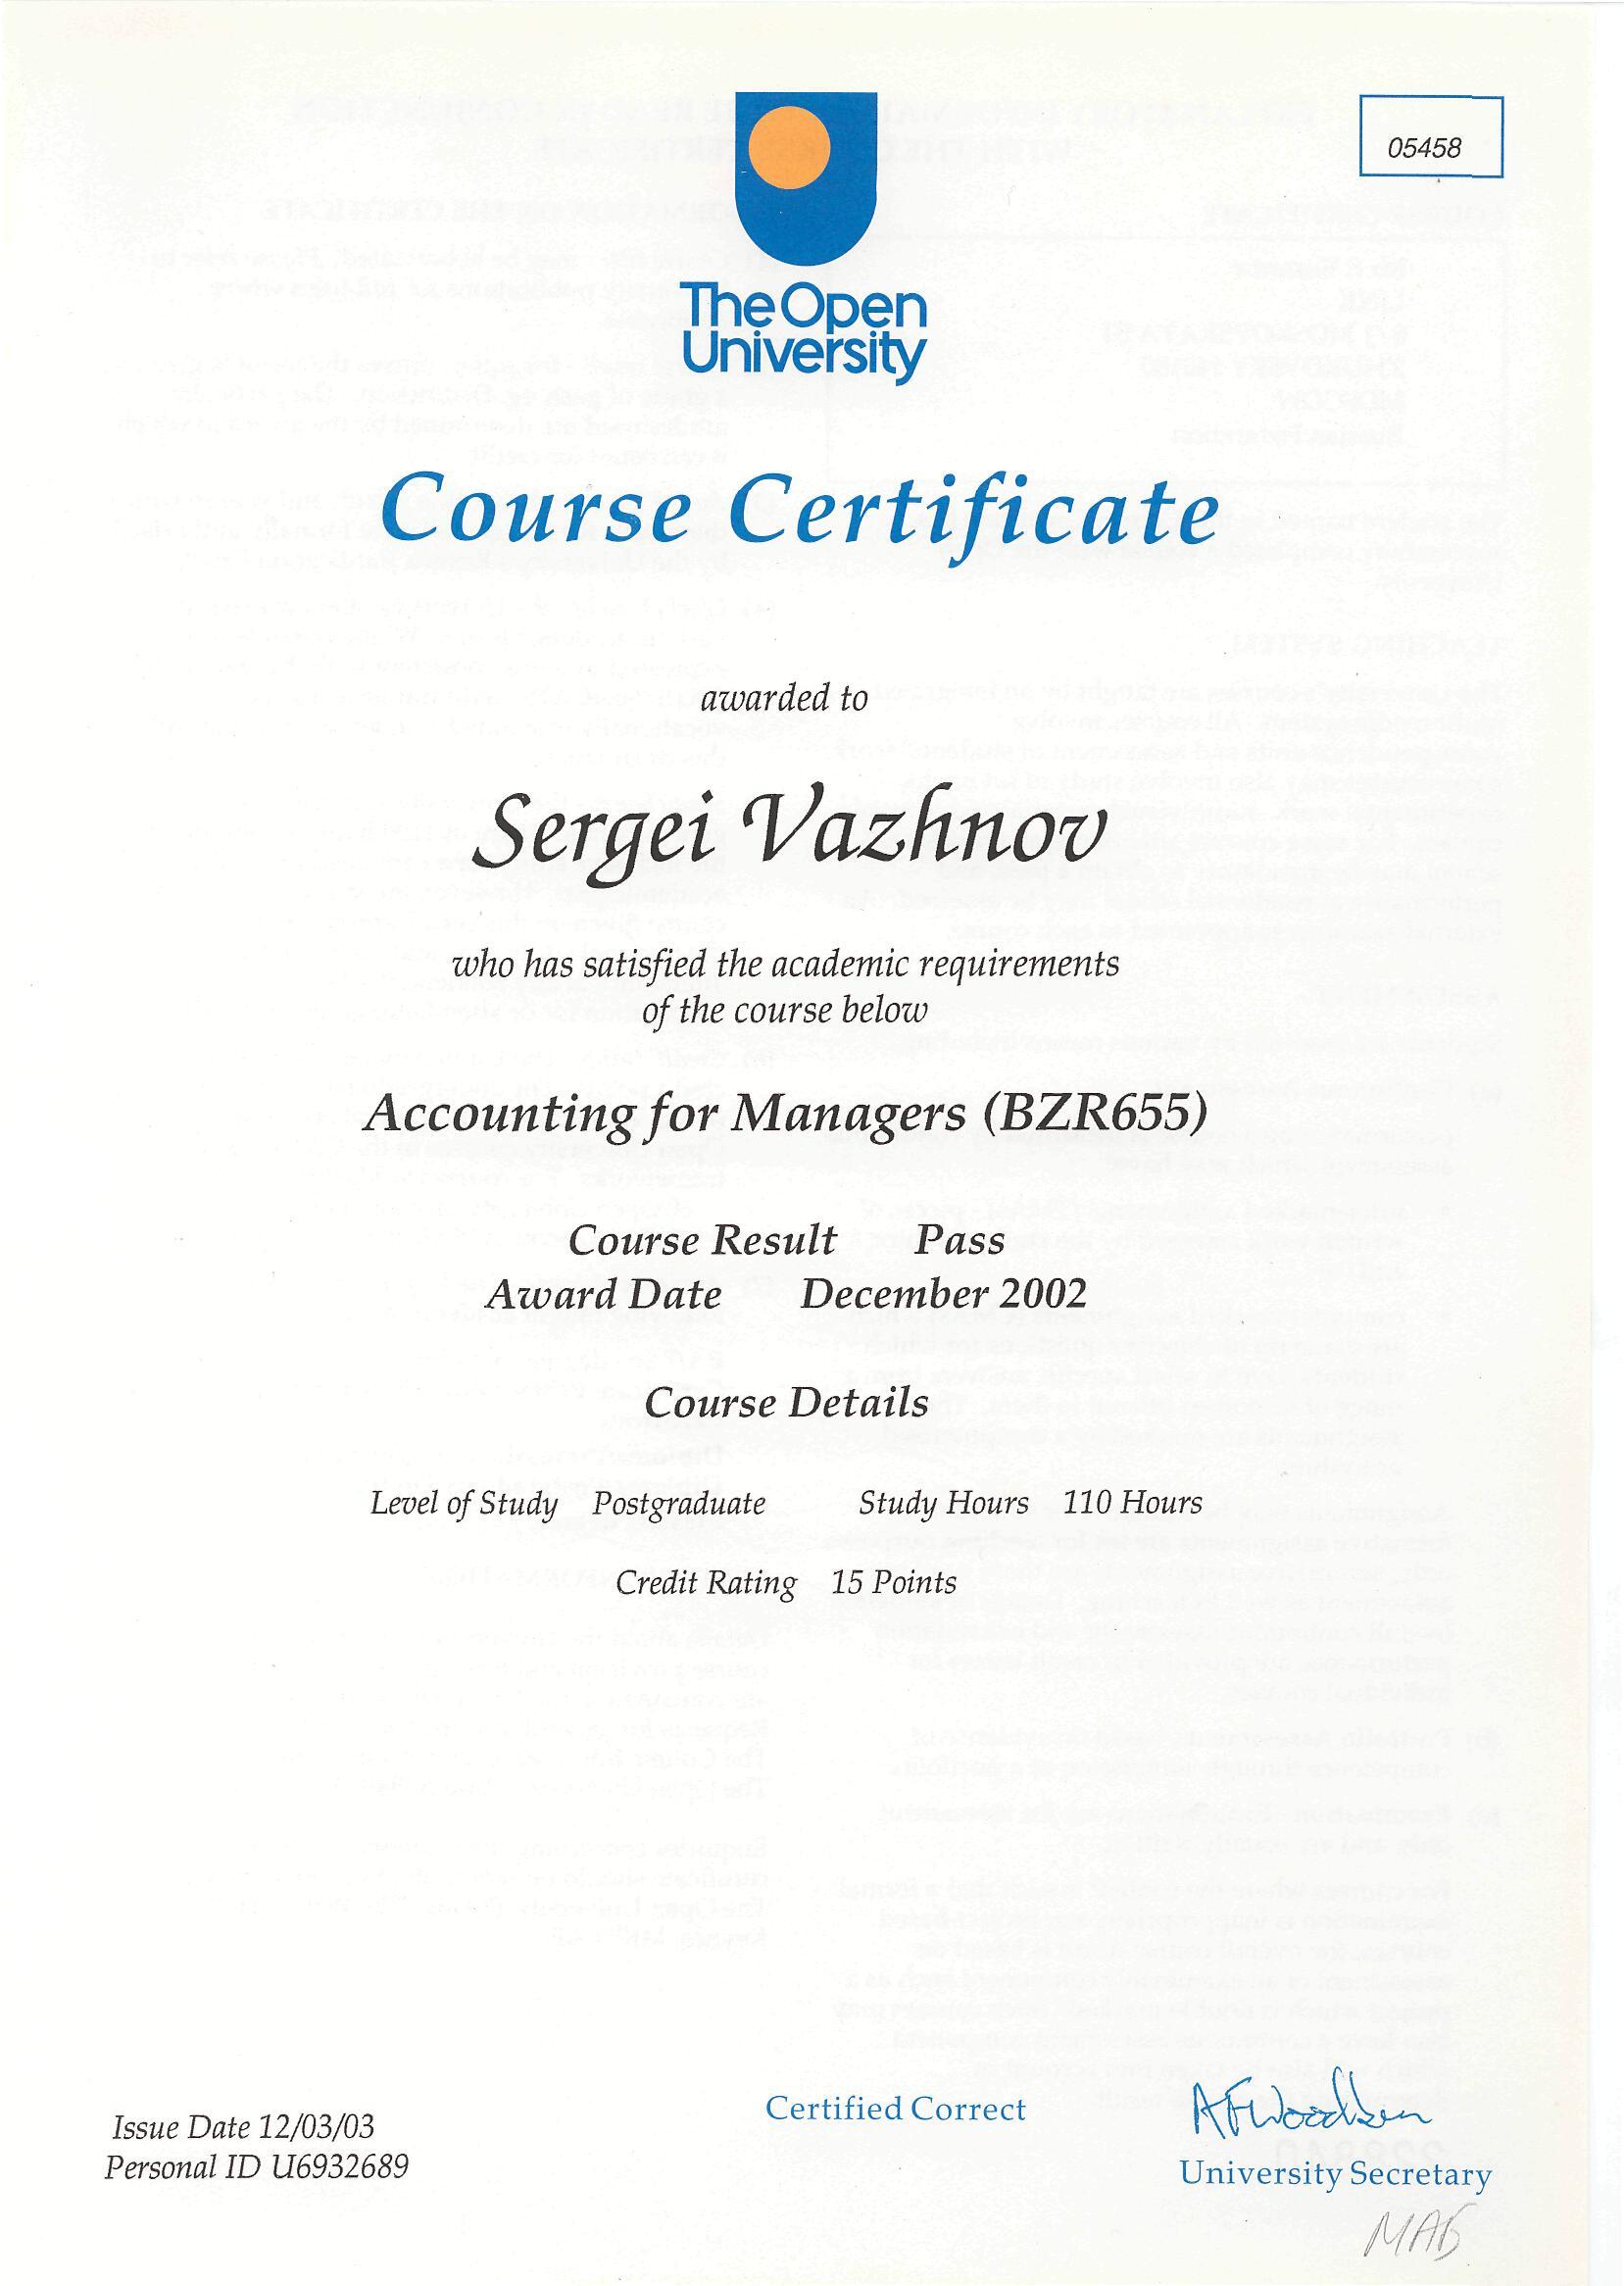 Bookkeeping universities course